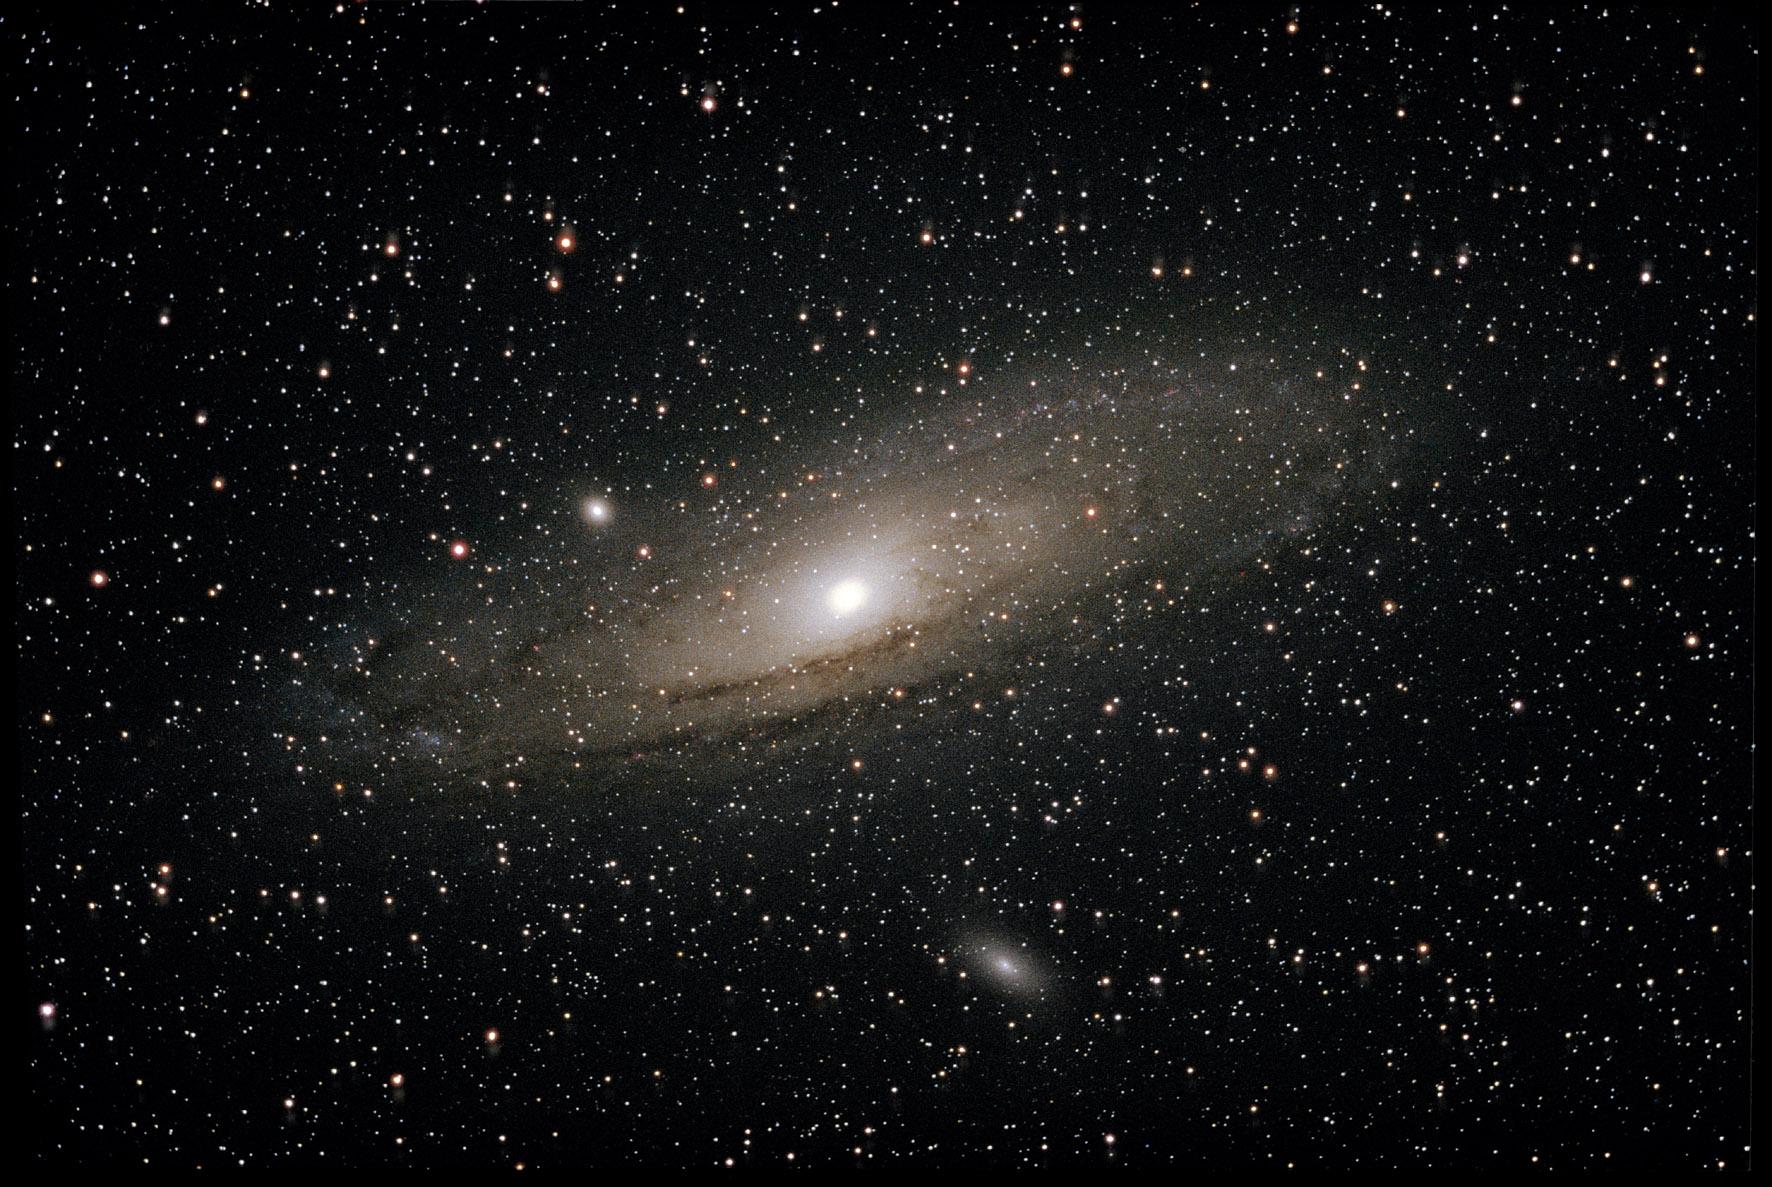 Et puis le ciel ultra profond, les galaxies